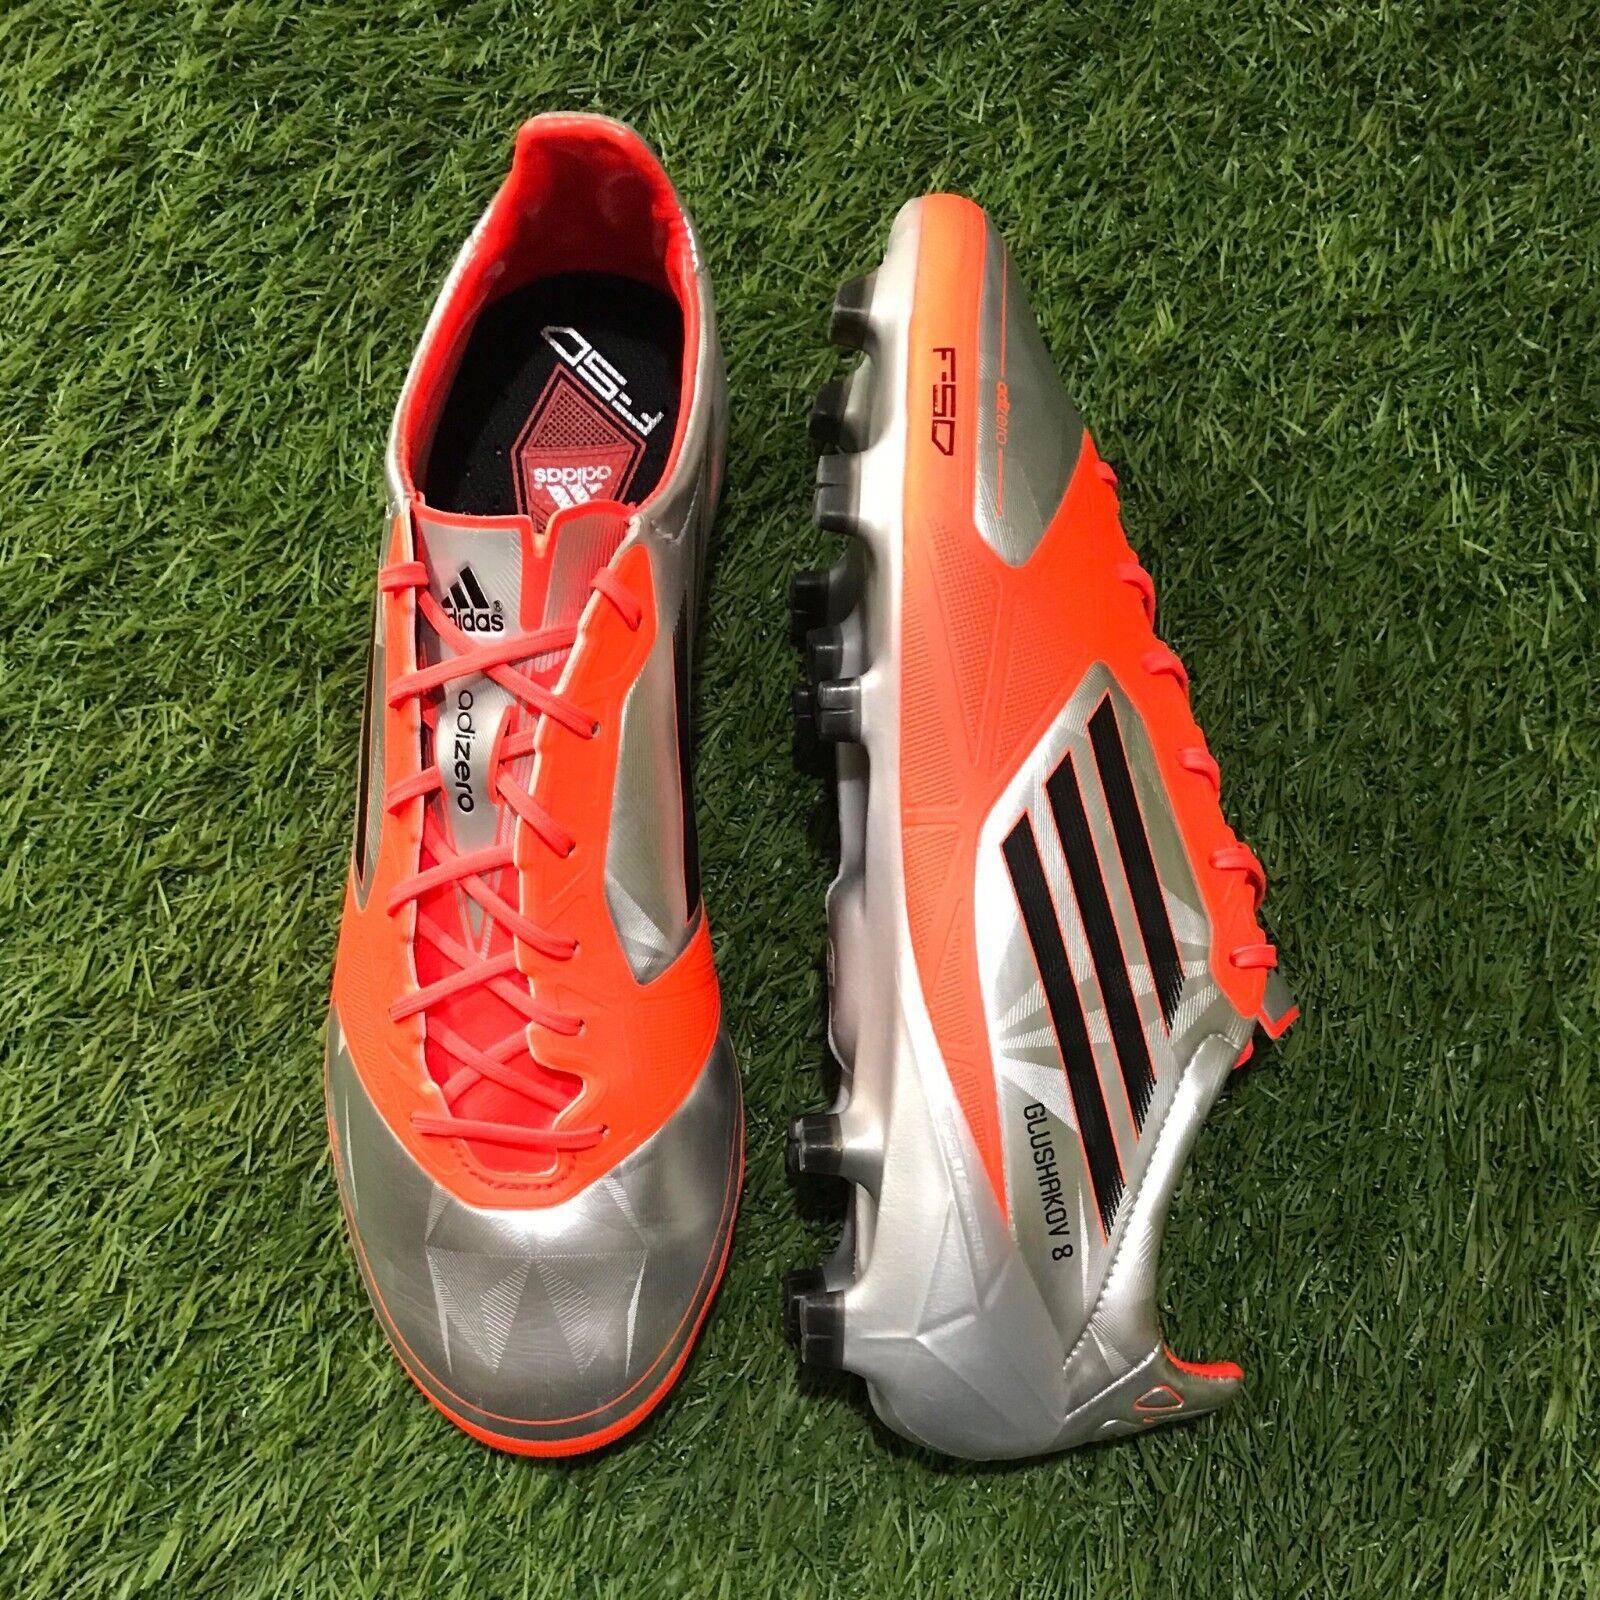 Adidas Adizero F50 TRX FG 8 US Denis Glushakov Rusia Nacional Match Worn botas